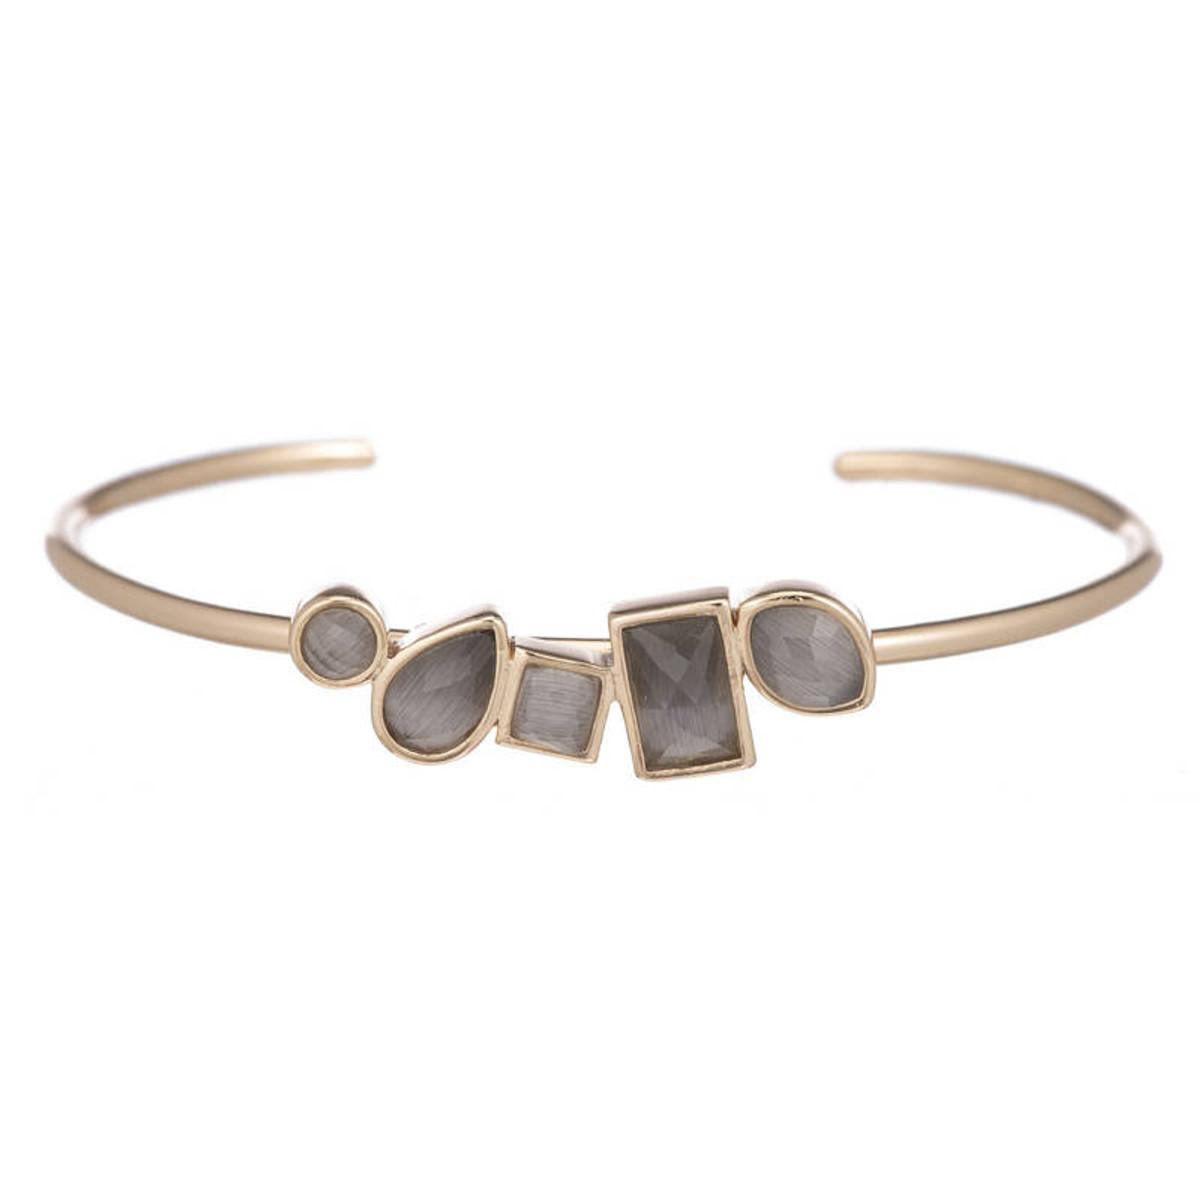 Grey Cashel bracelet by Marcia Moran Jewelry